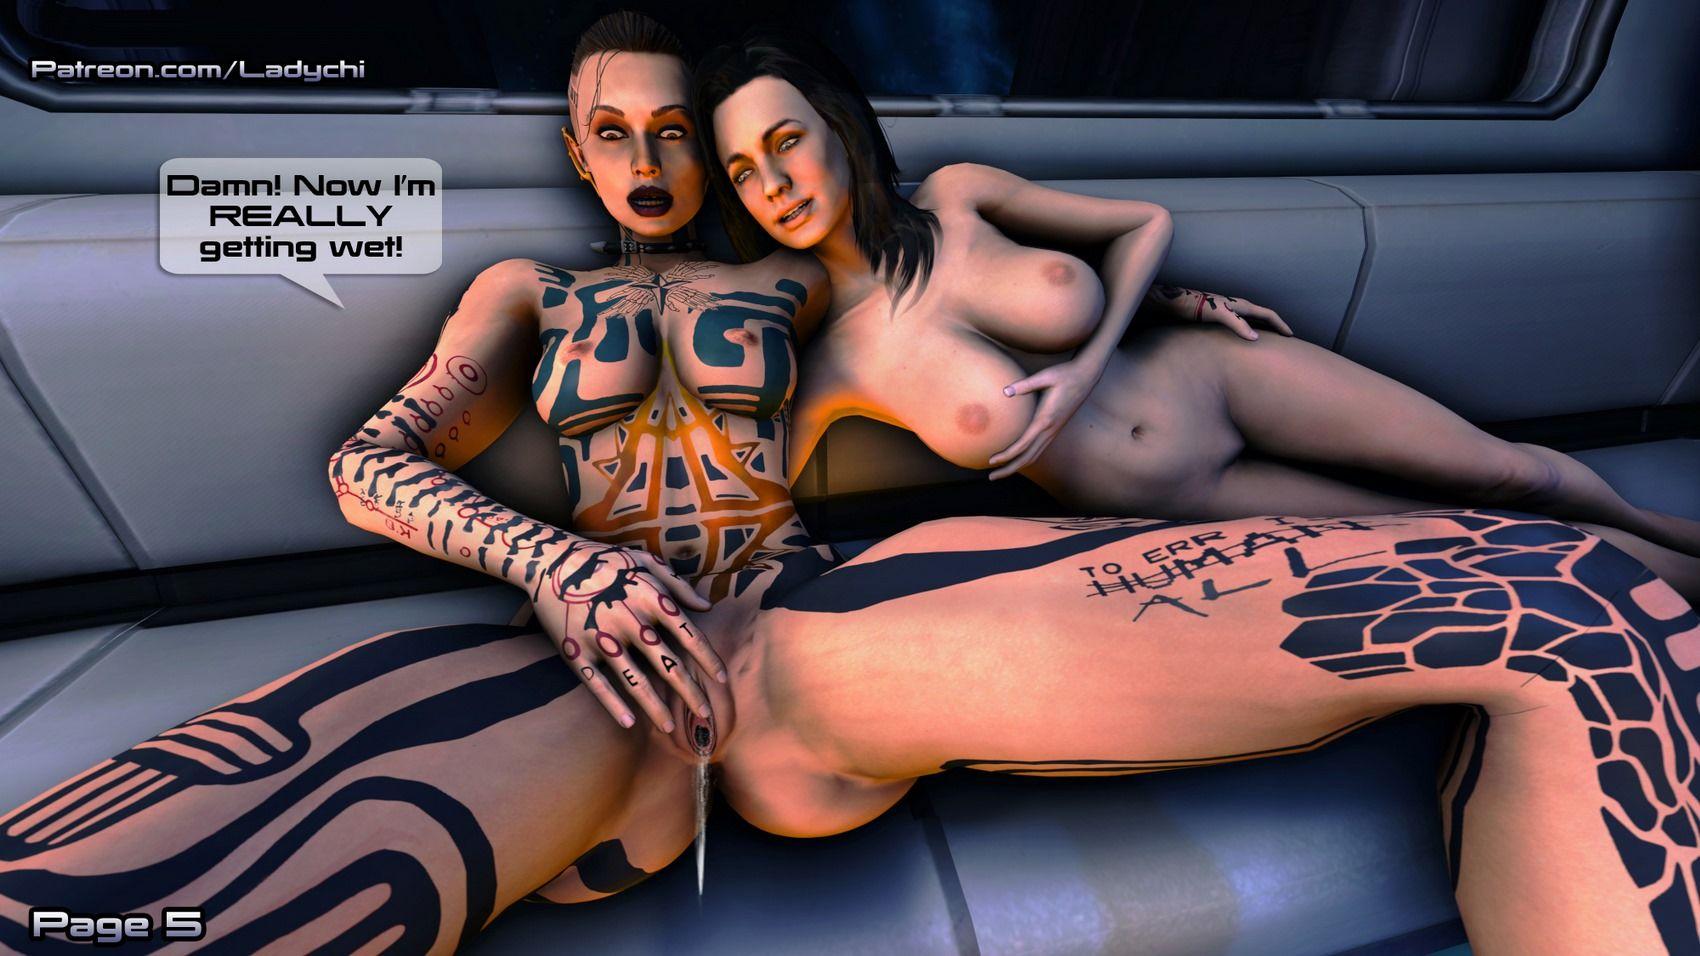 Jacks_Dream_Ladychi_(Mass_Effect) comix_57826.jpg